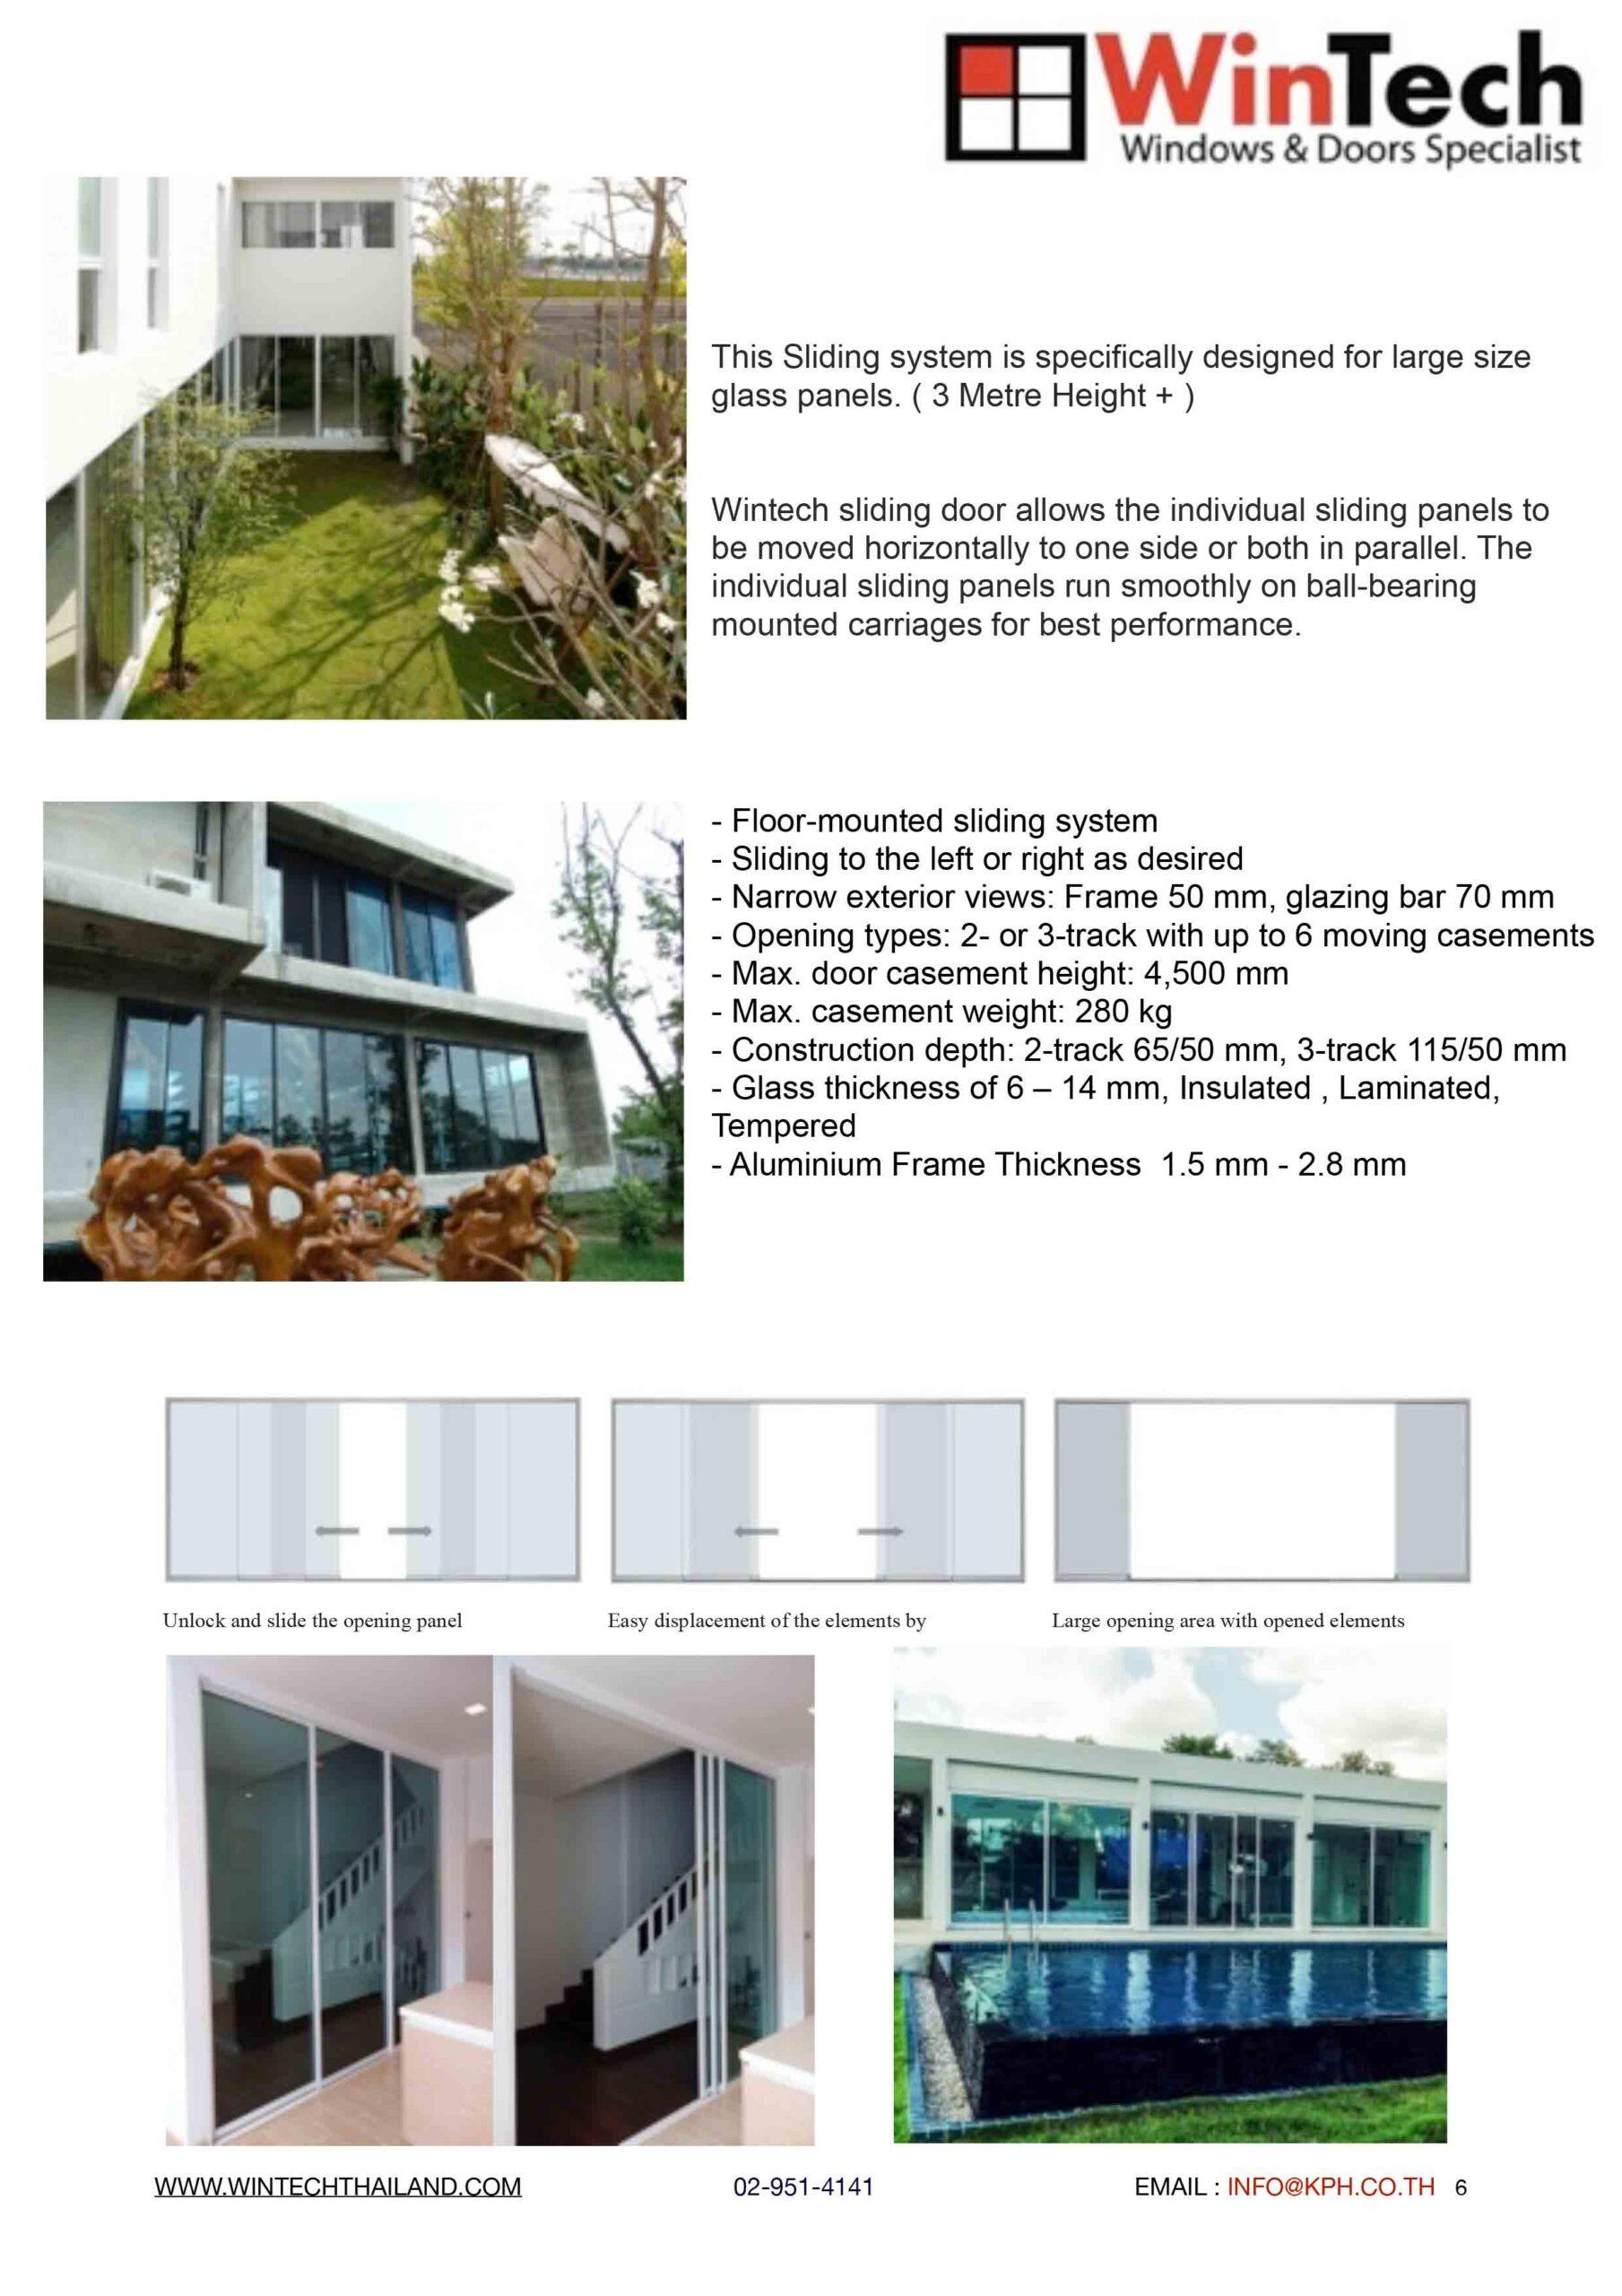 Wintech-Italy-Brochure-commp-6